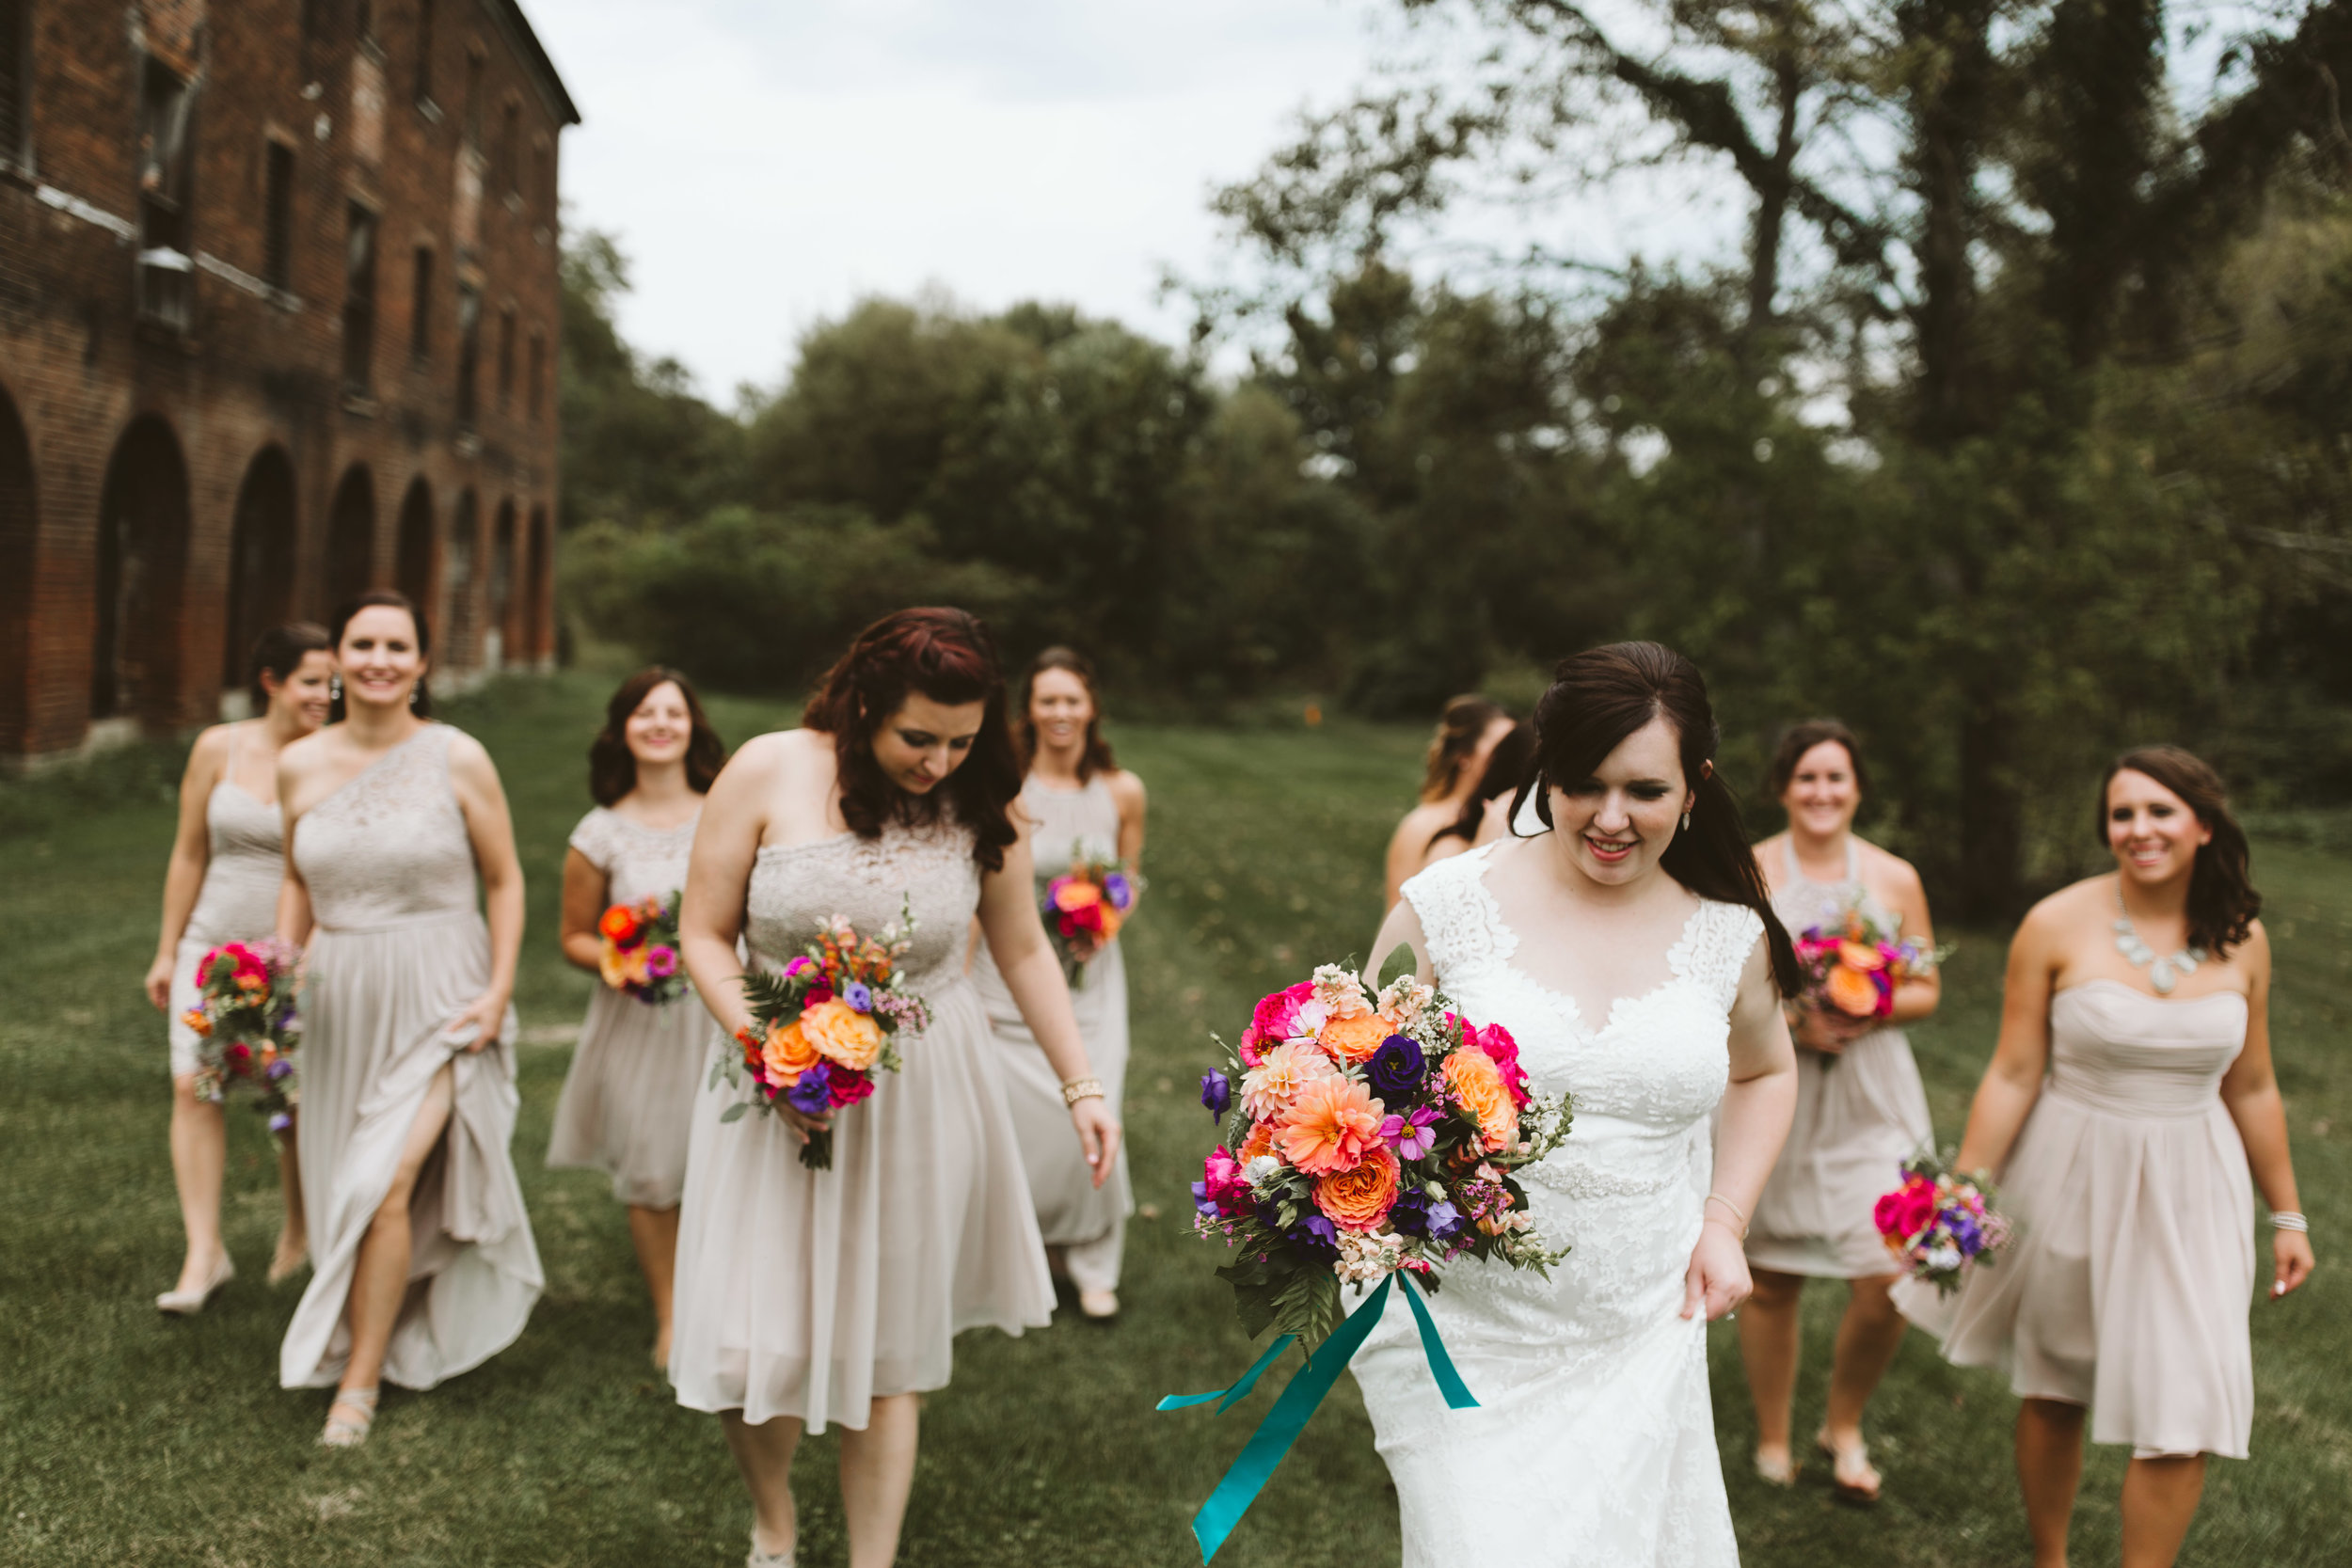 hotmetalstudio pittsburgh wedding photography-434.jpg